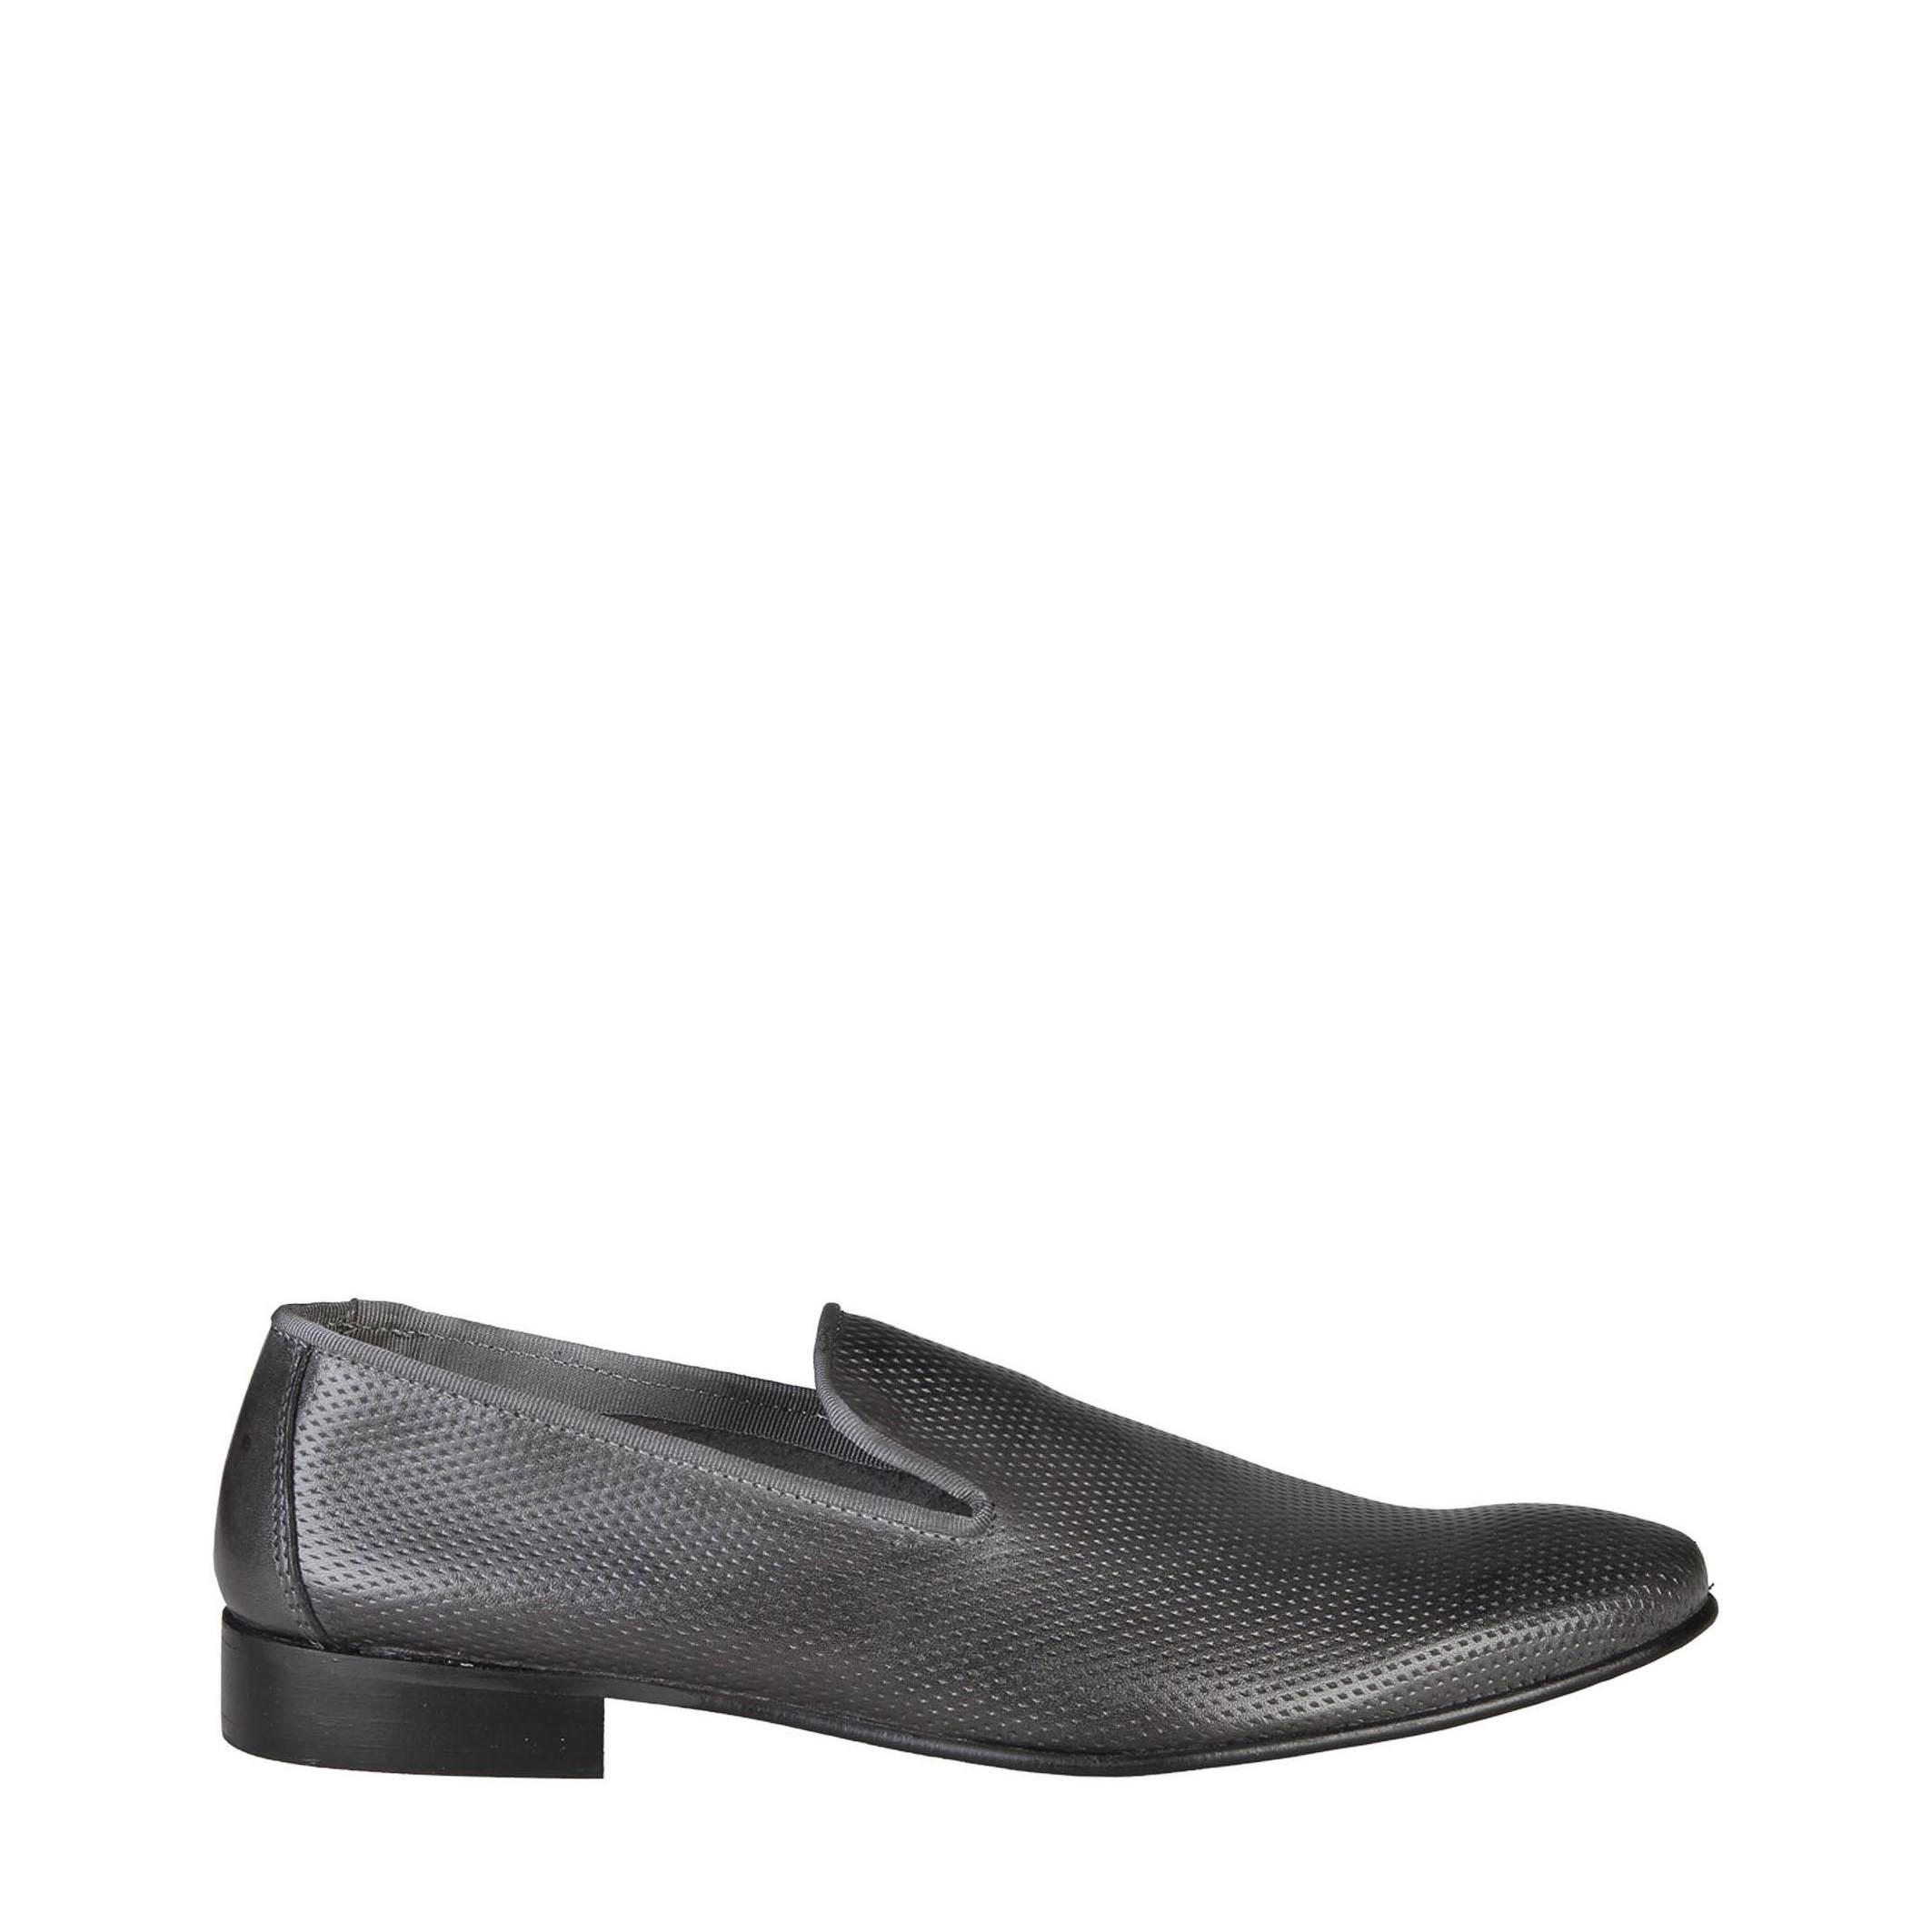 Chaussures   V 1969 FELIX grey